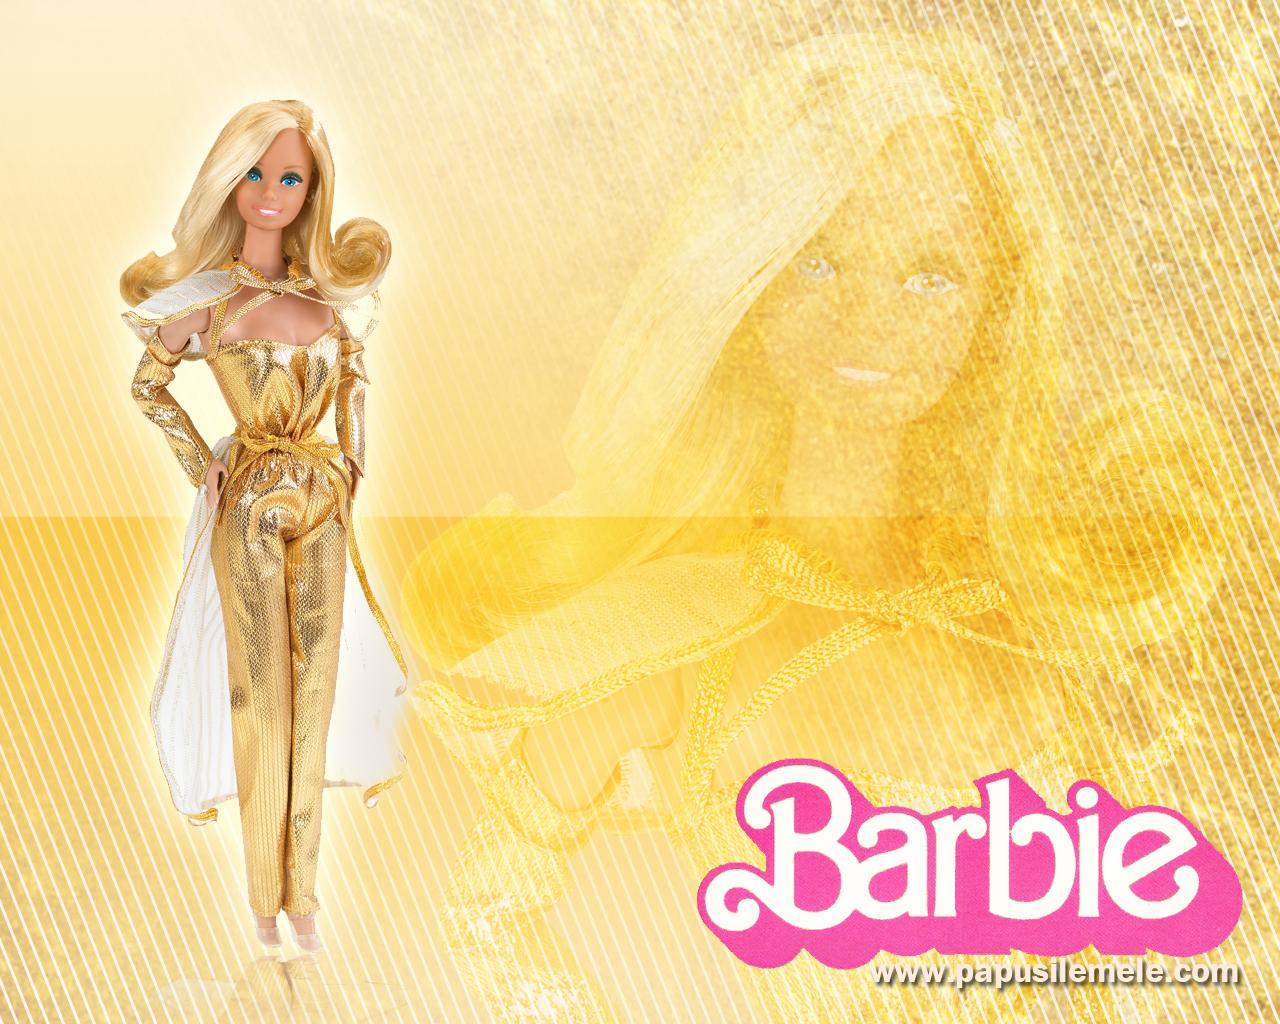 hd wallpaper: Barbie Wallpaper background